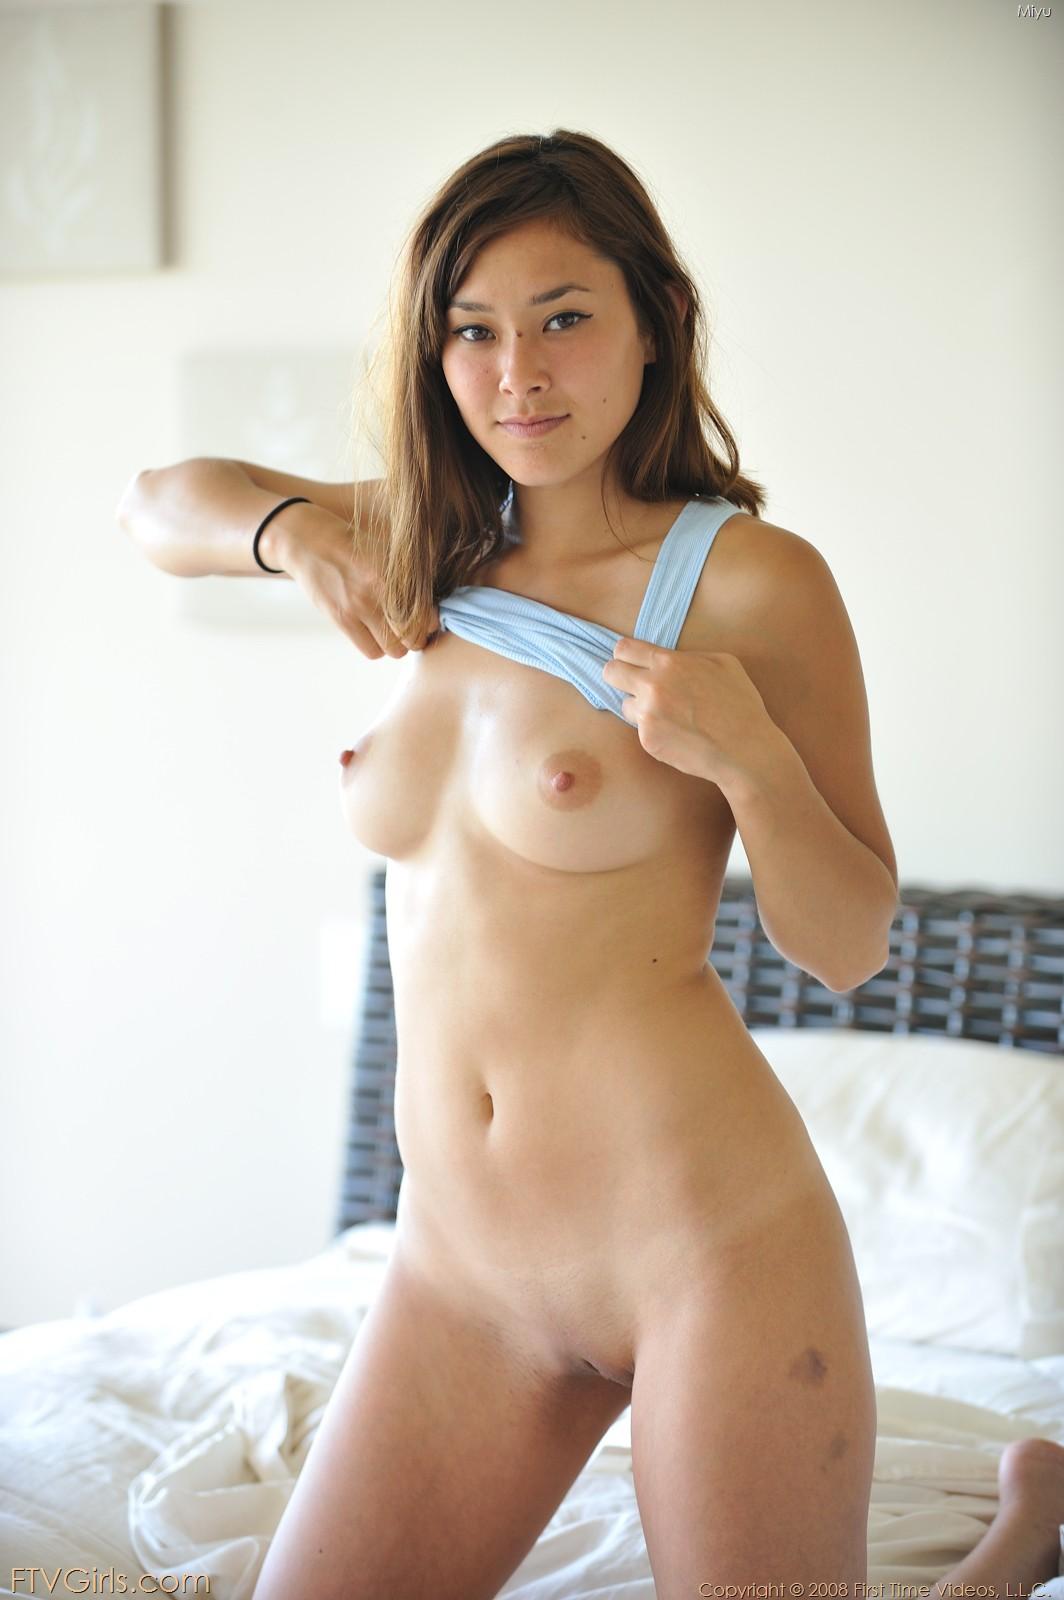 Ashley tisdale nipple slip